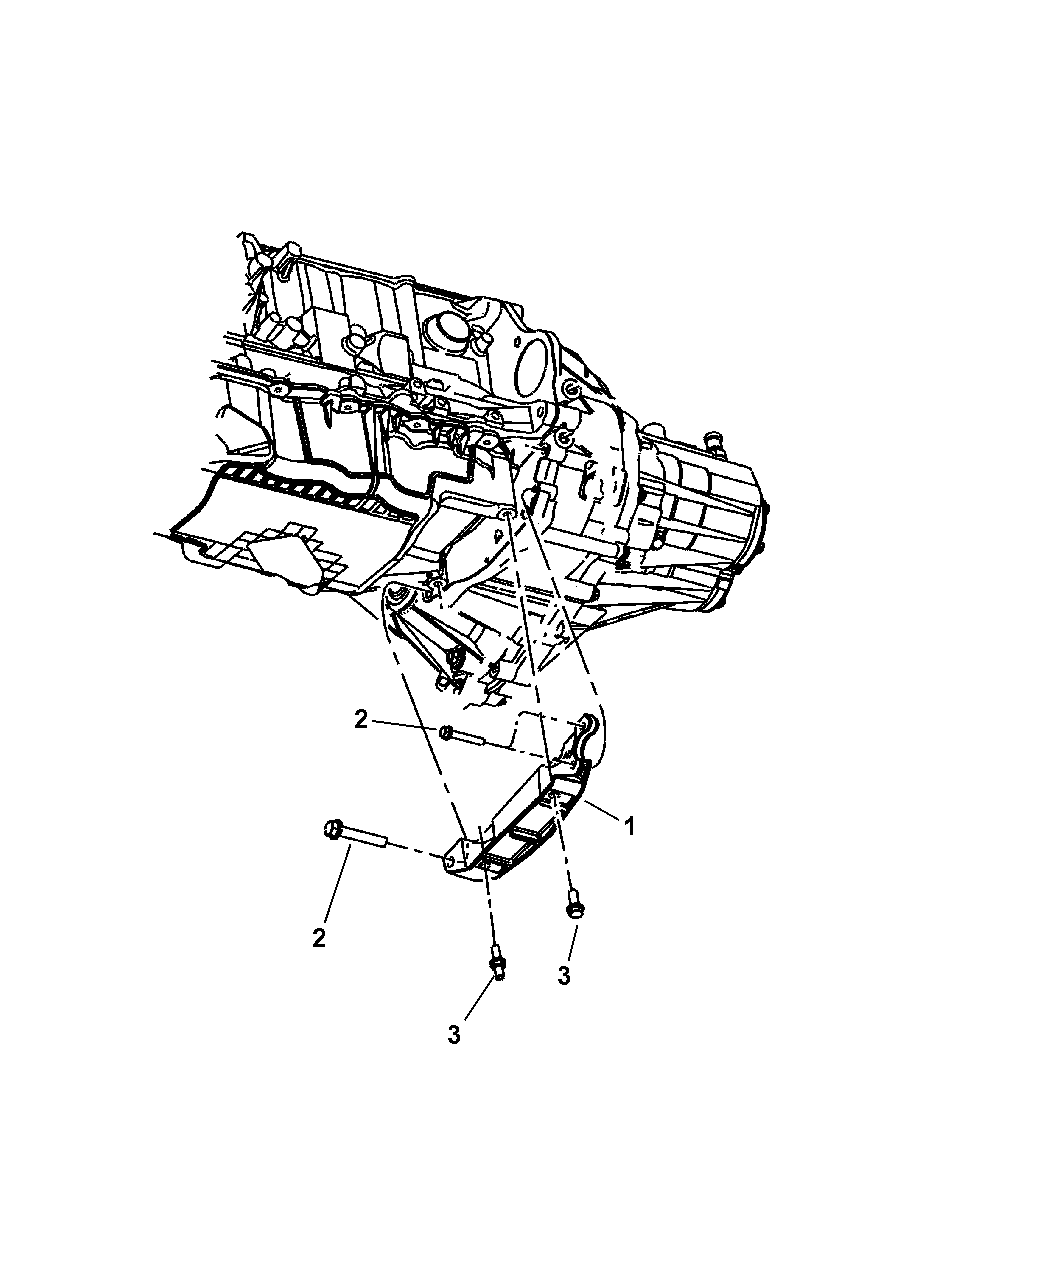 2009 Chrysler PT Cruiser Structural Collar of Manual